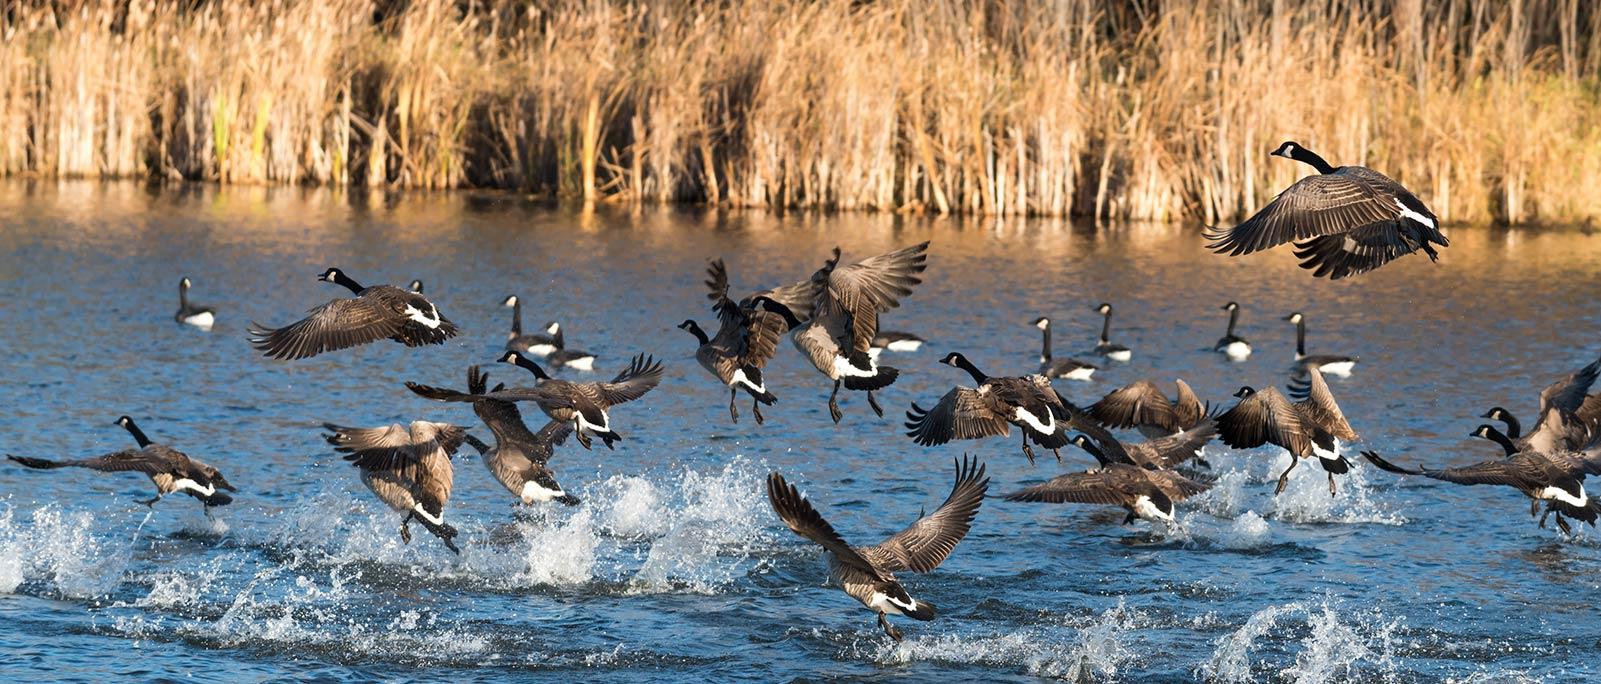 Geese Hunting Texas